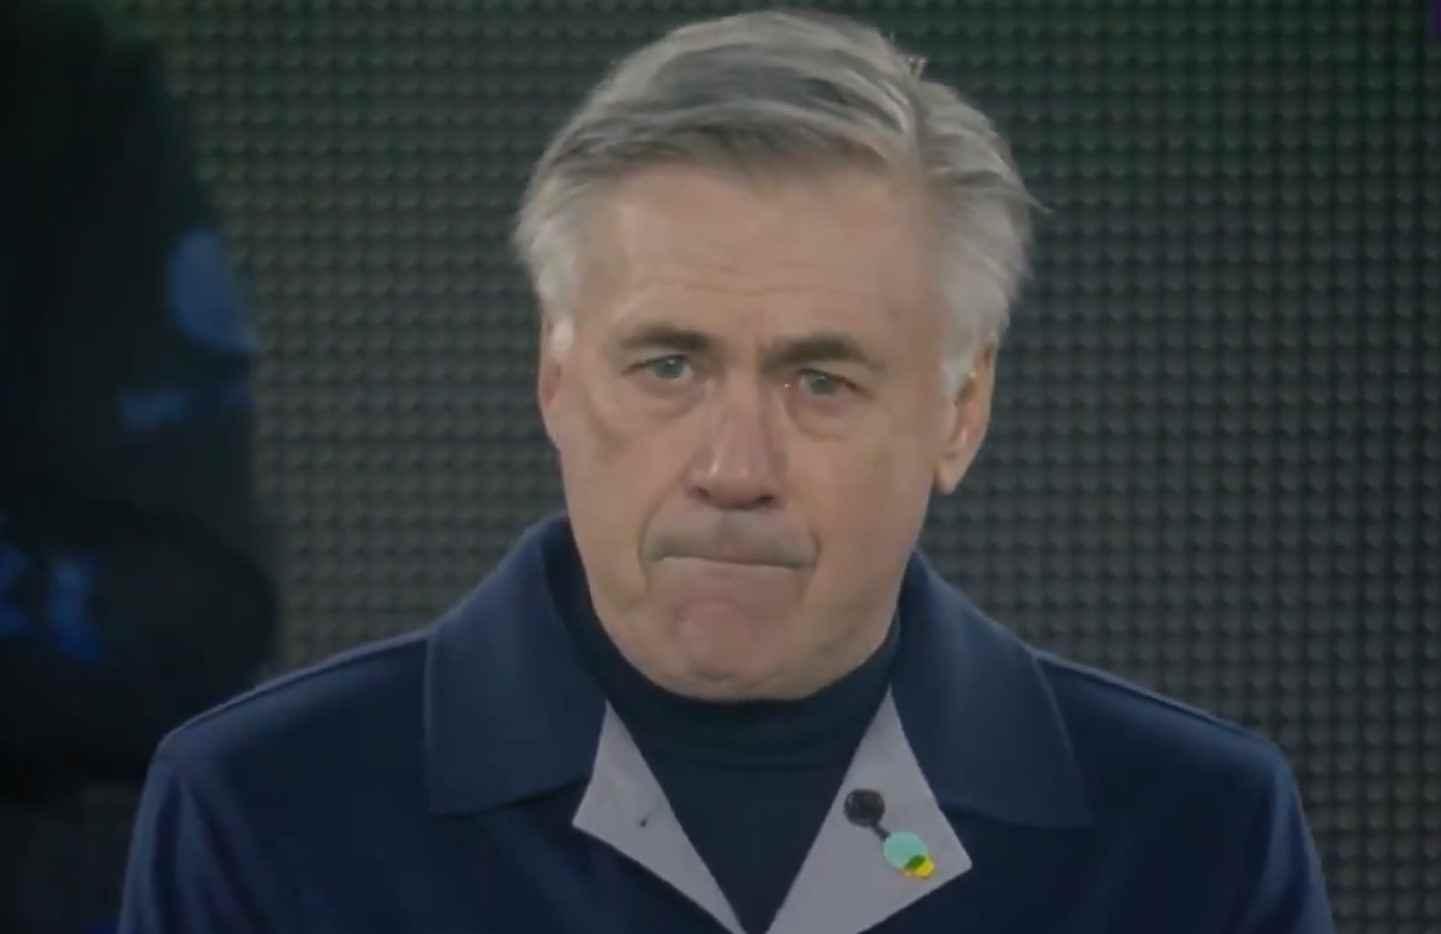 Carlo Ancelotti, bastante conmovido en homenaje a Maradona